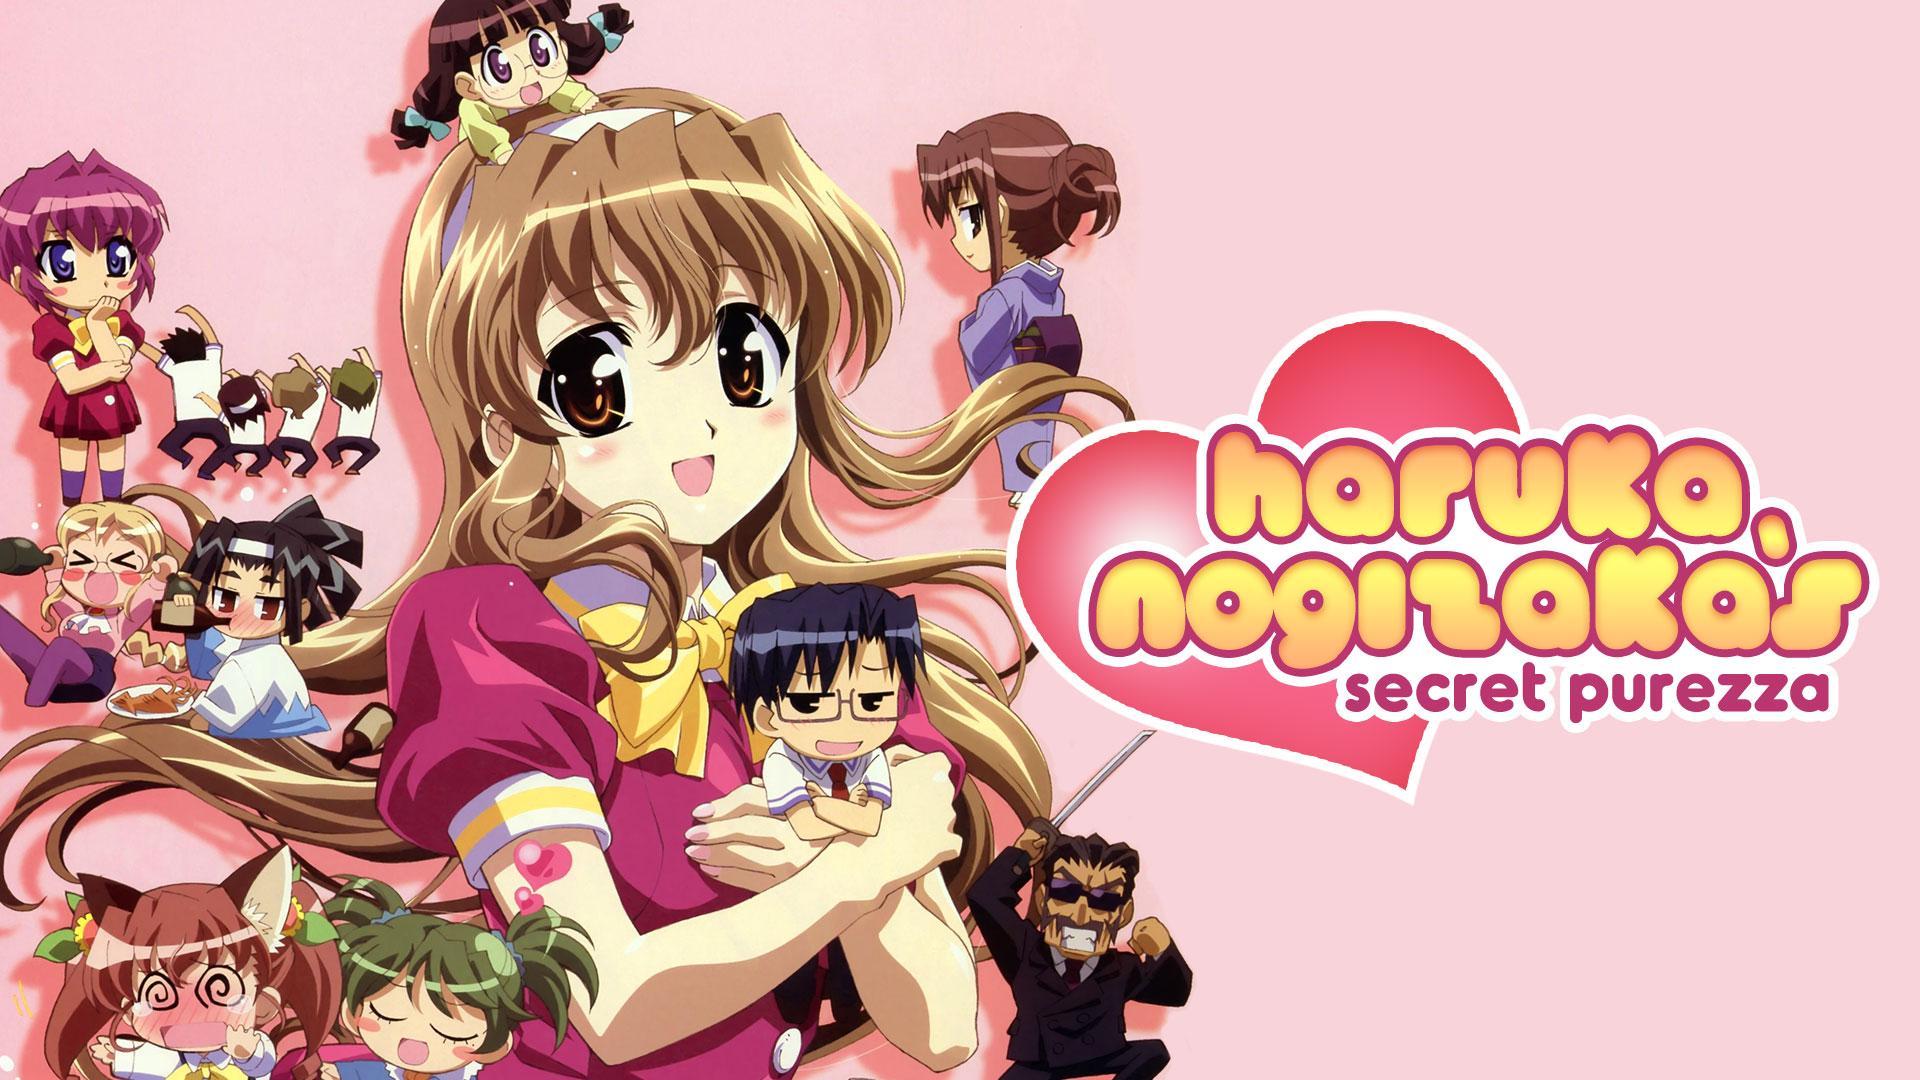 Haruka Nogizaka's Secret Purezza